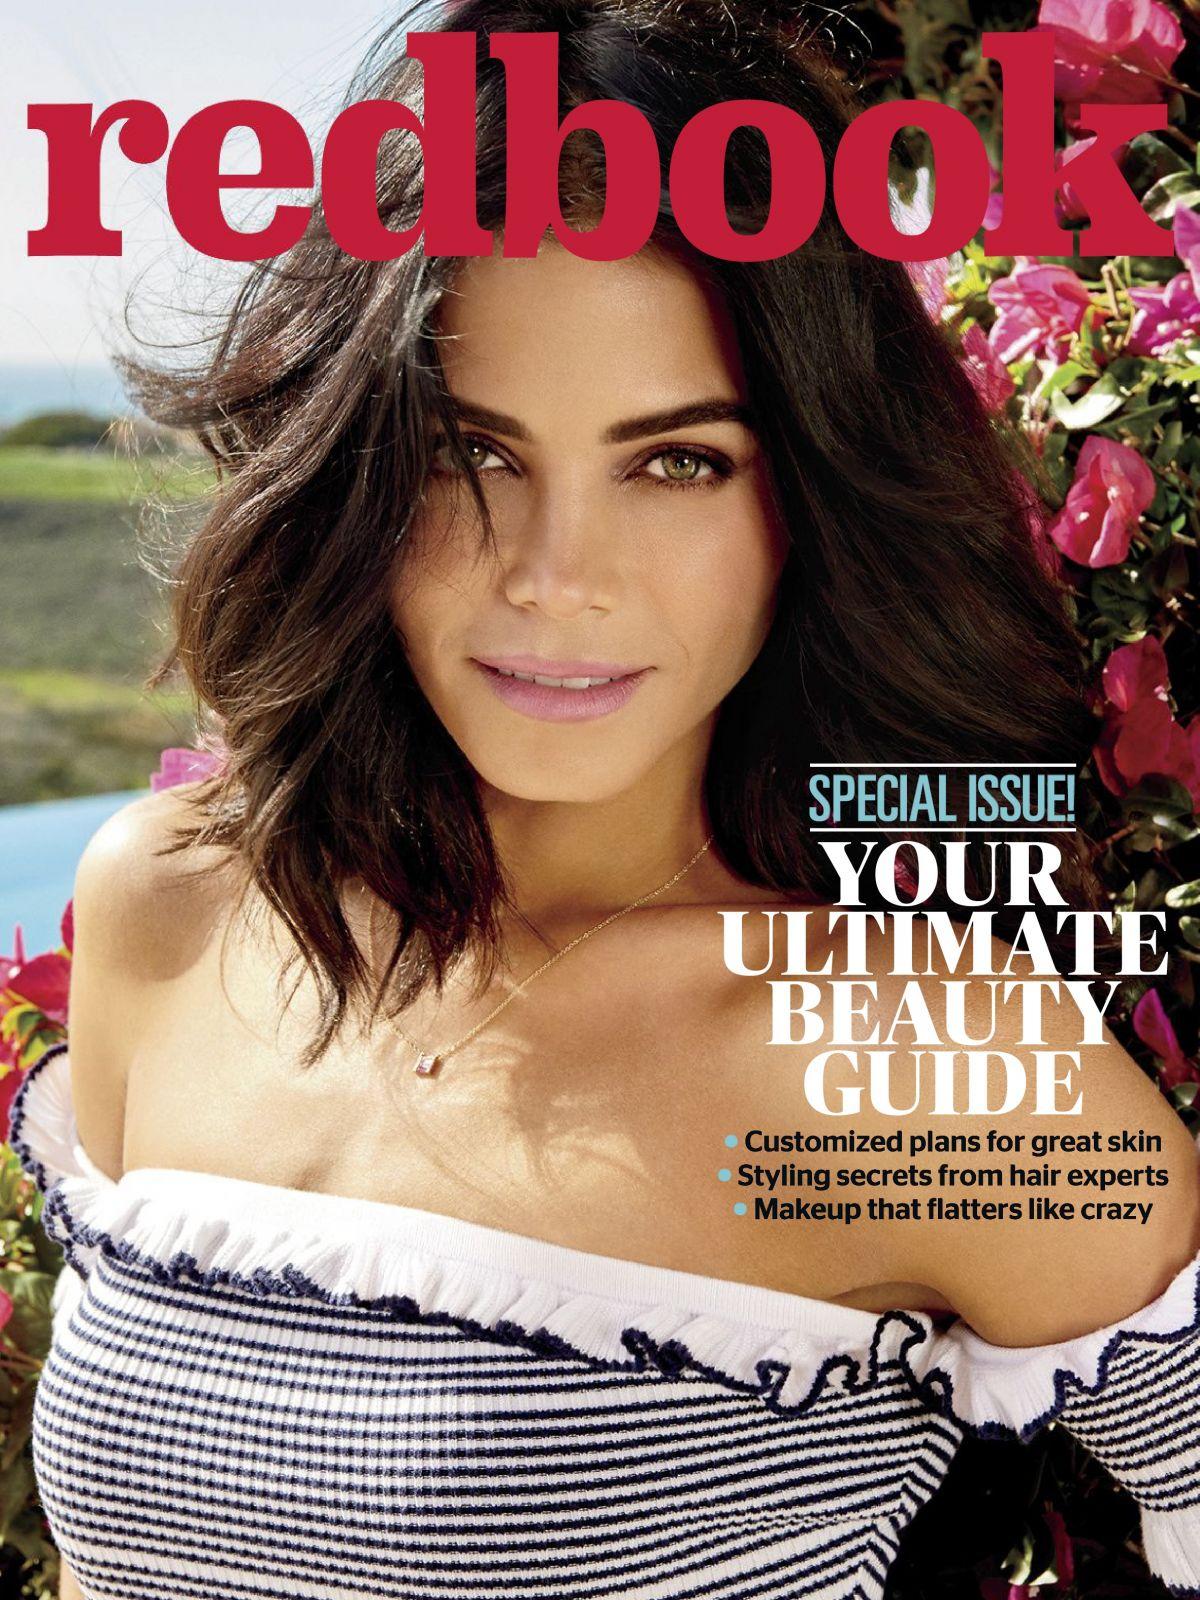 JENNA DEWAN in Redbook Magazine, May 2017